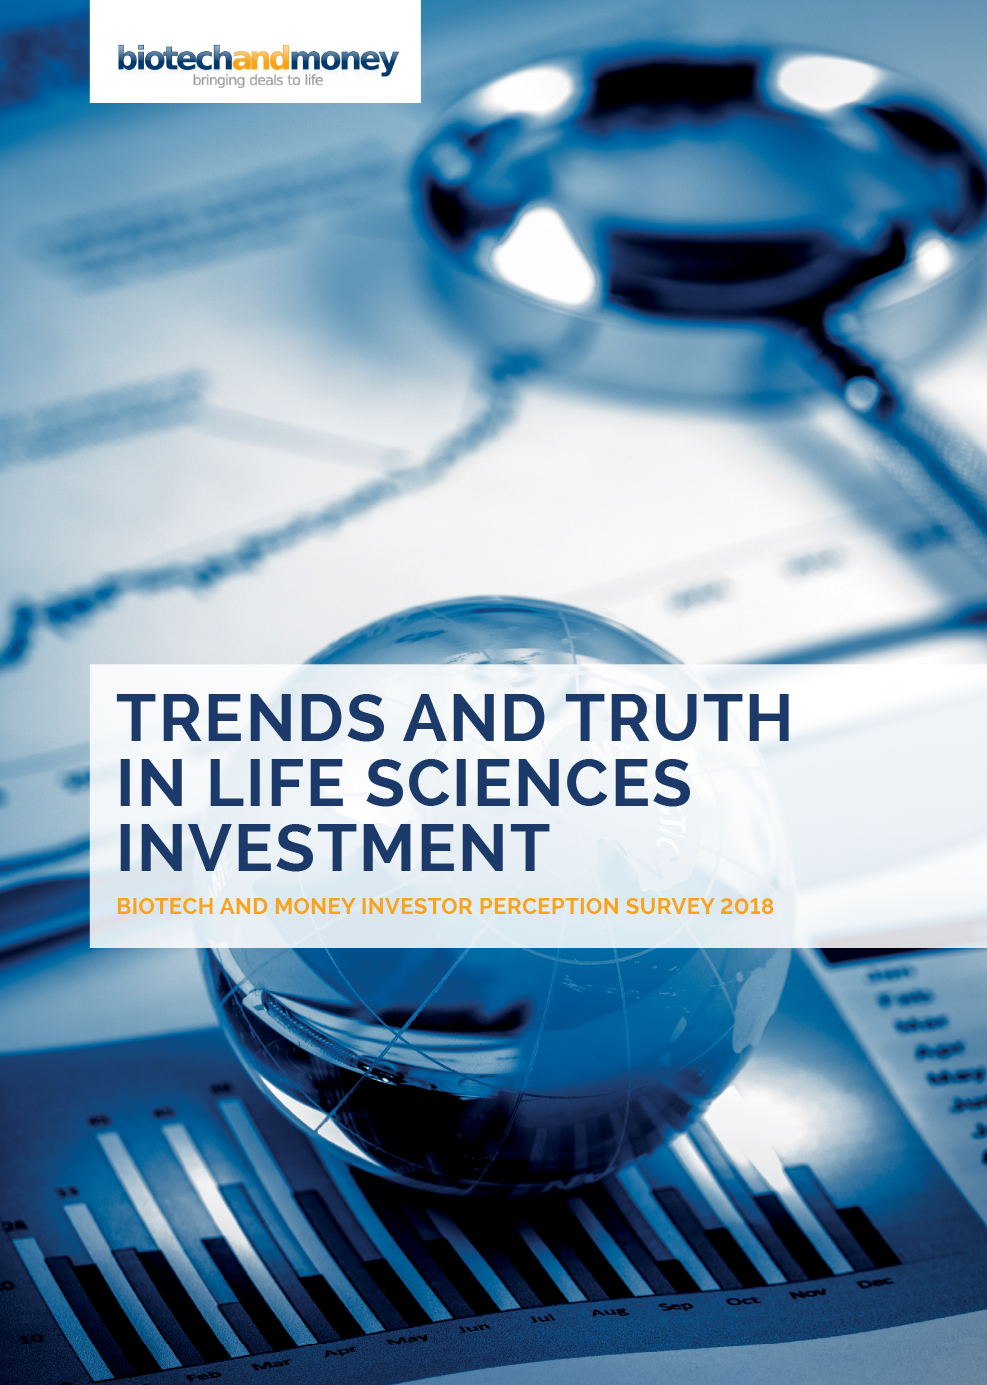 Biotech and Money Investor Perception Survey 2018